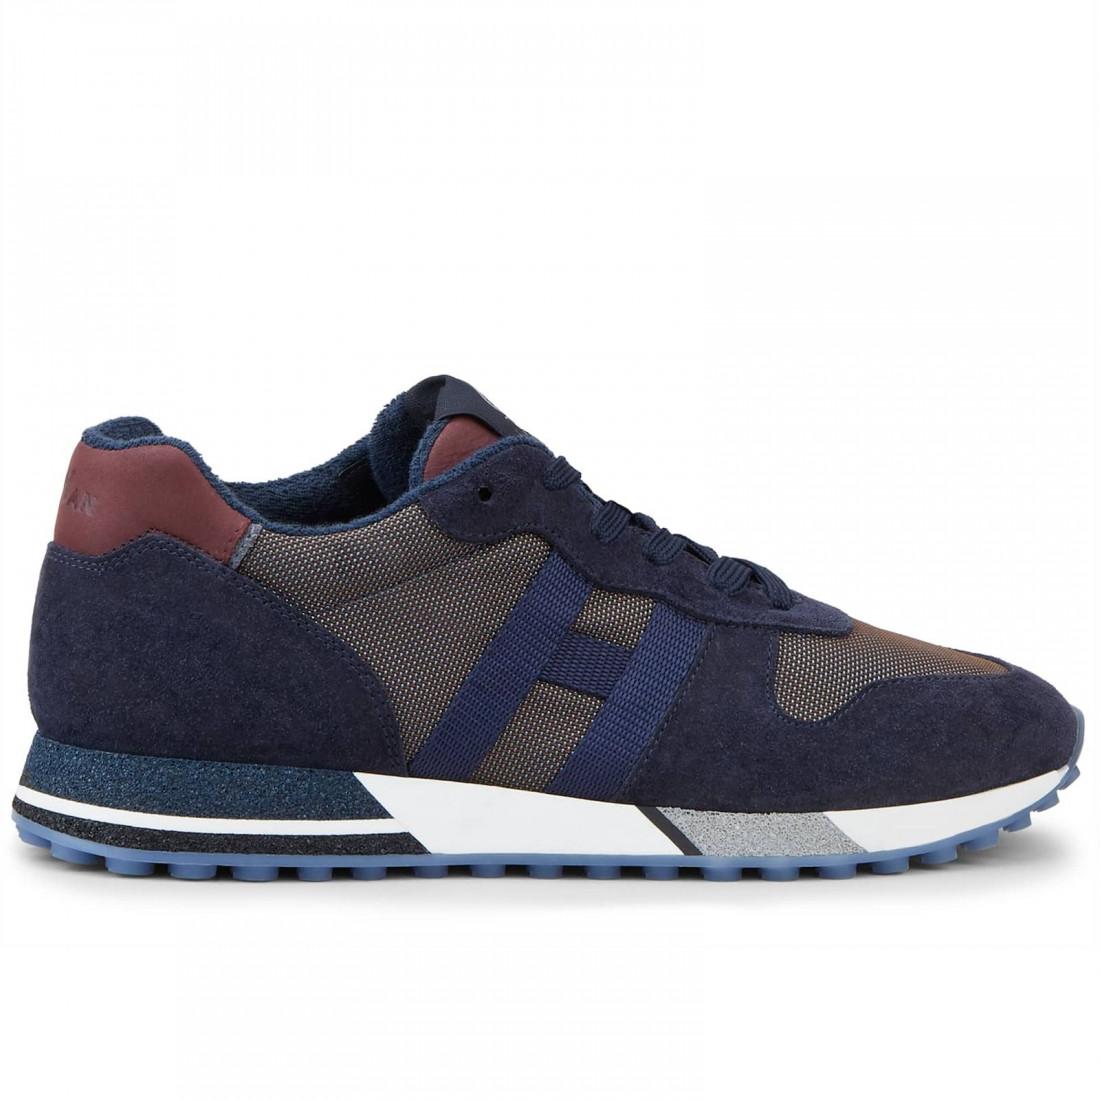 Men's Hogan H383 blue and burgundy sneakers